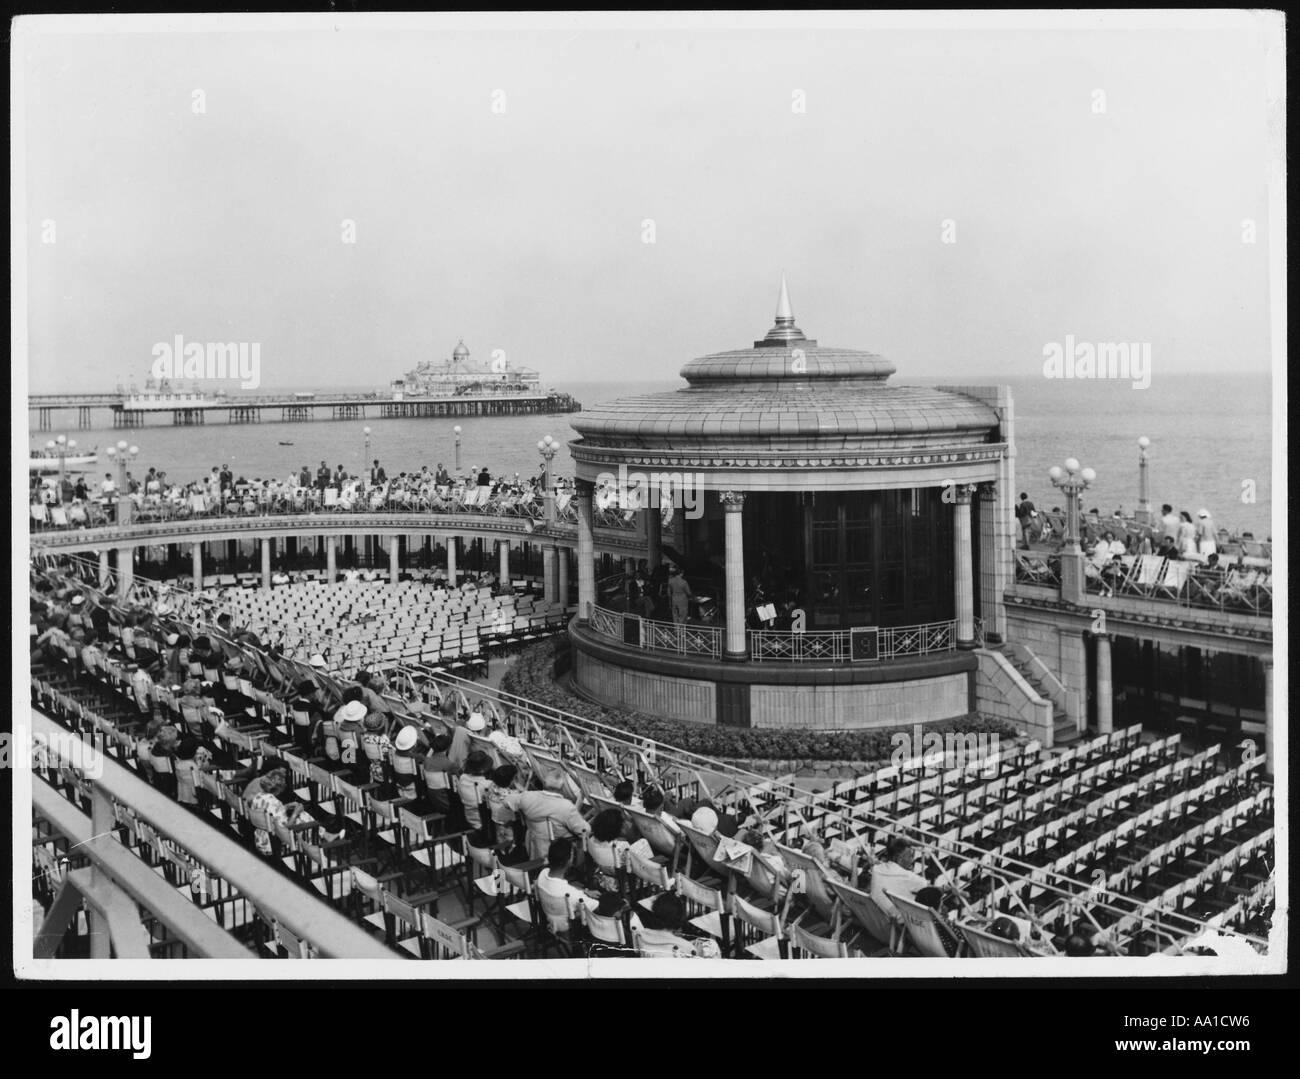 Bandstand At Eastbourne - Stock Image